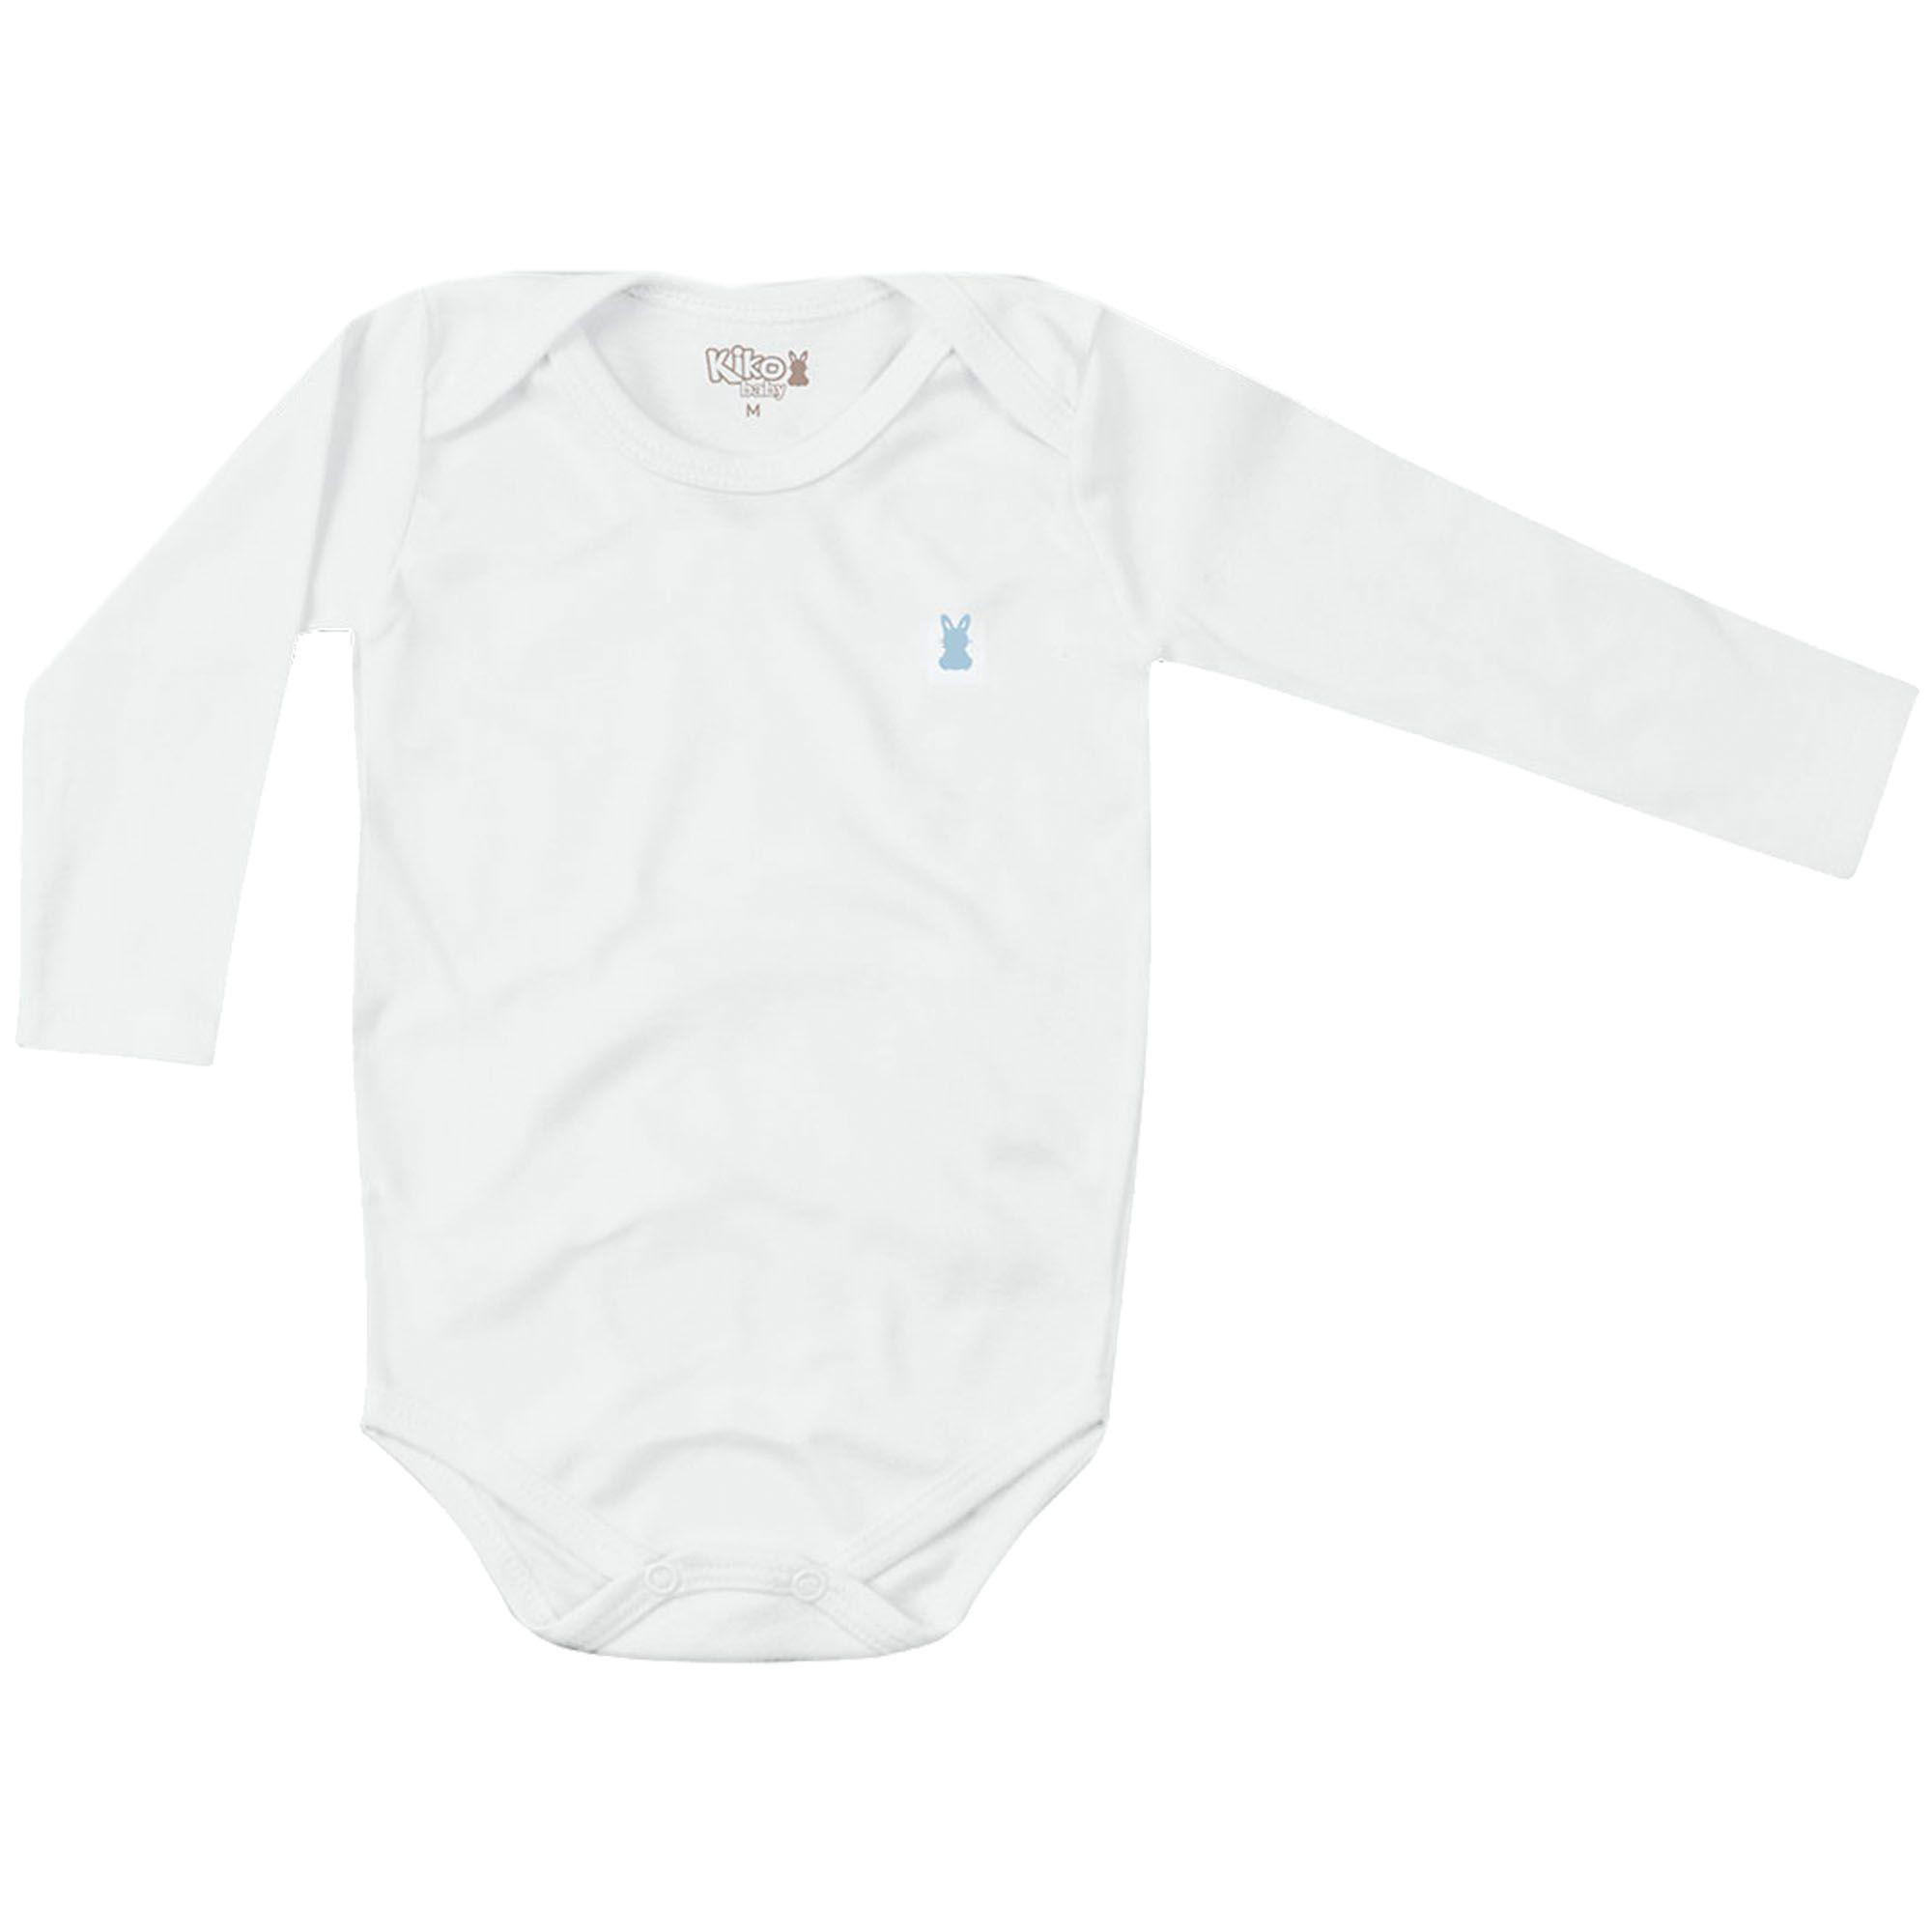 Body Kiko Baby Branco Liso - RN ao M